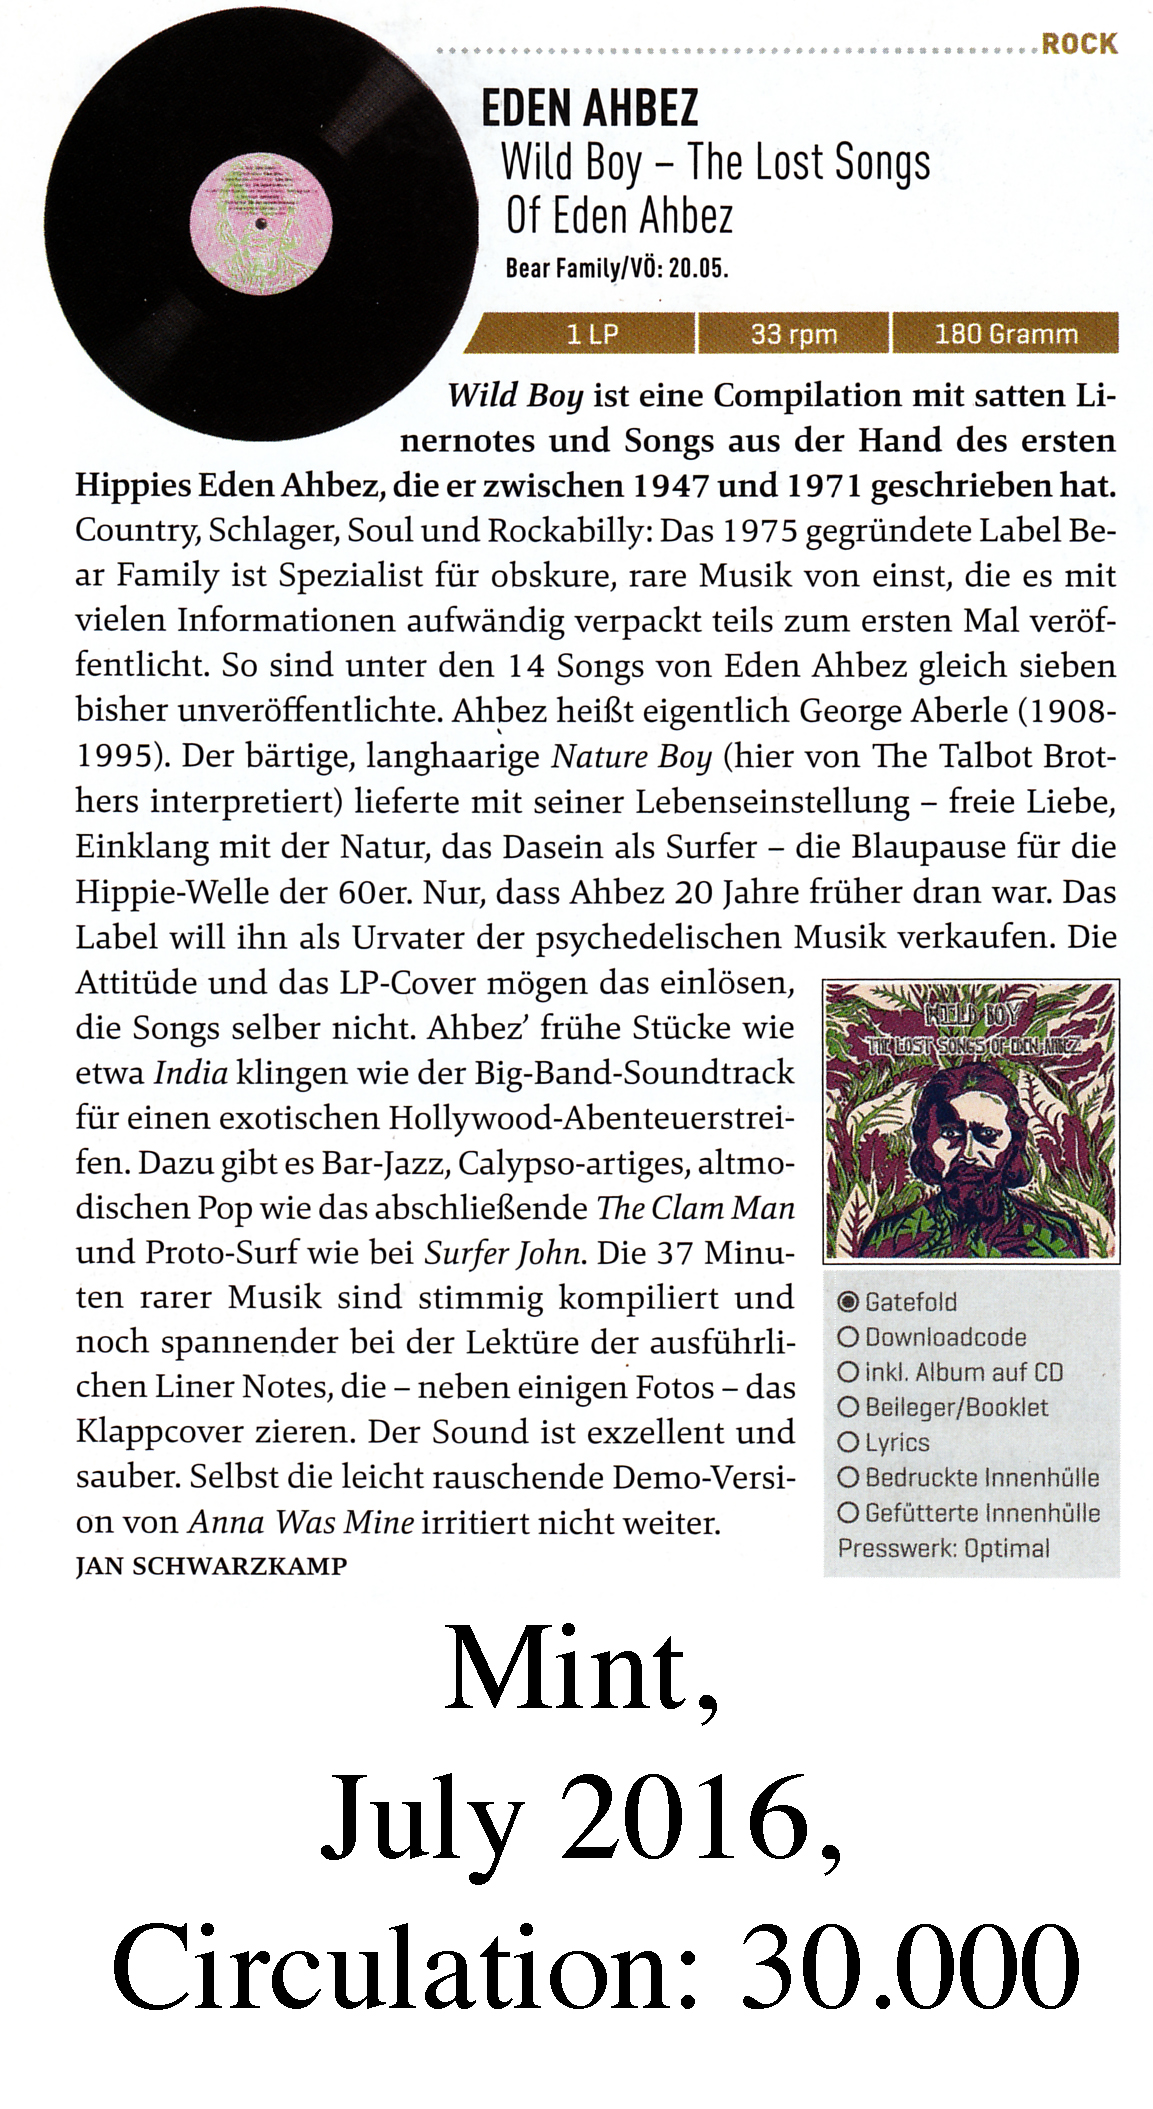 Presse - Eden Ahbez Wild Boy — The Lost Songs Of Eden Ahbez Bear Family - Mint, July 2016